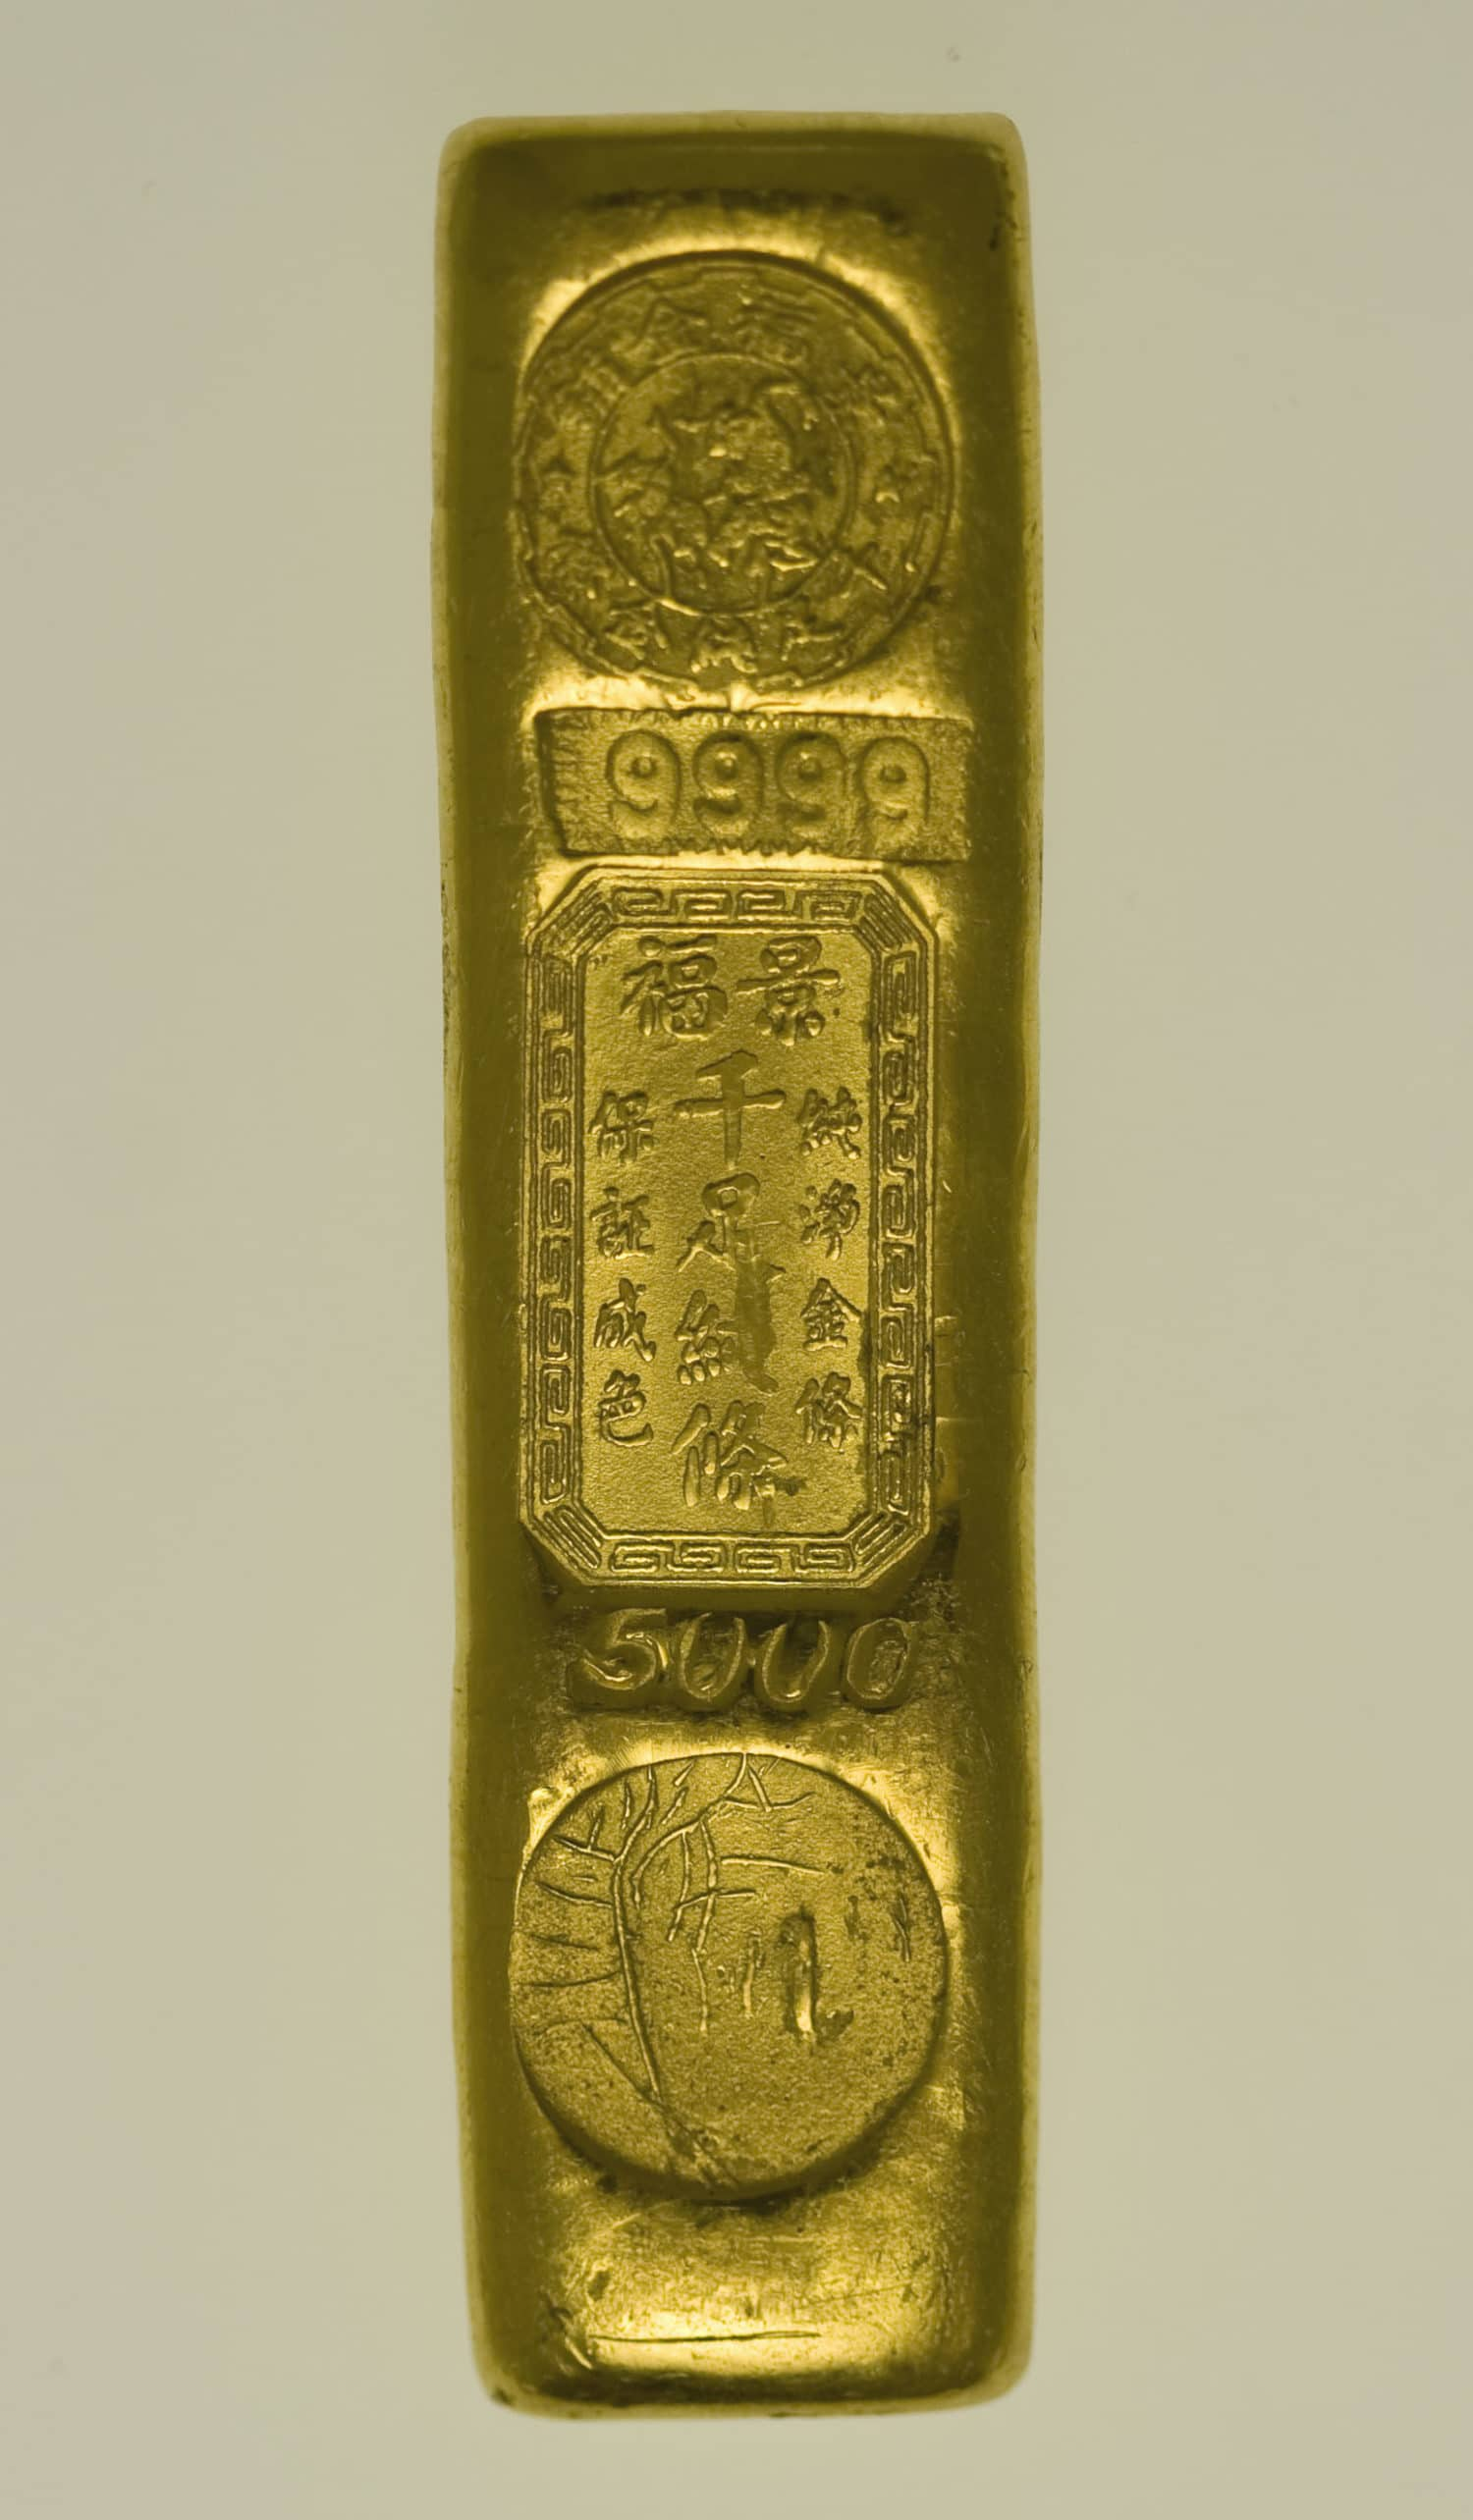 goldbarren - Goldbarren 5 Tael King Fook Jewellery Hong Kong